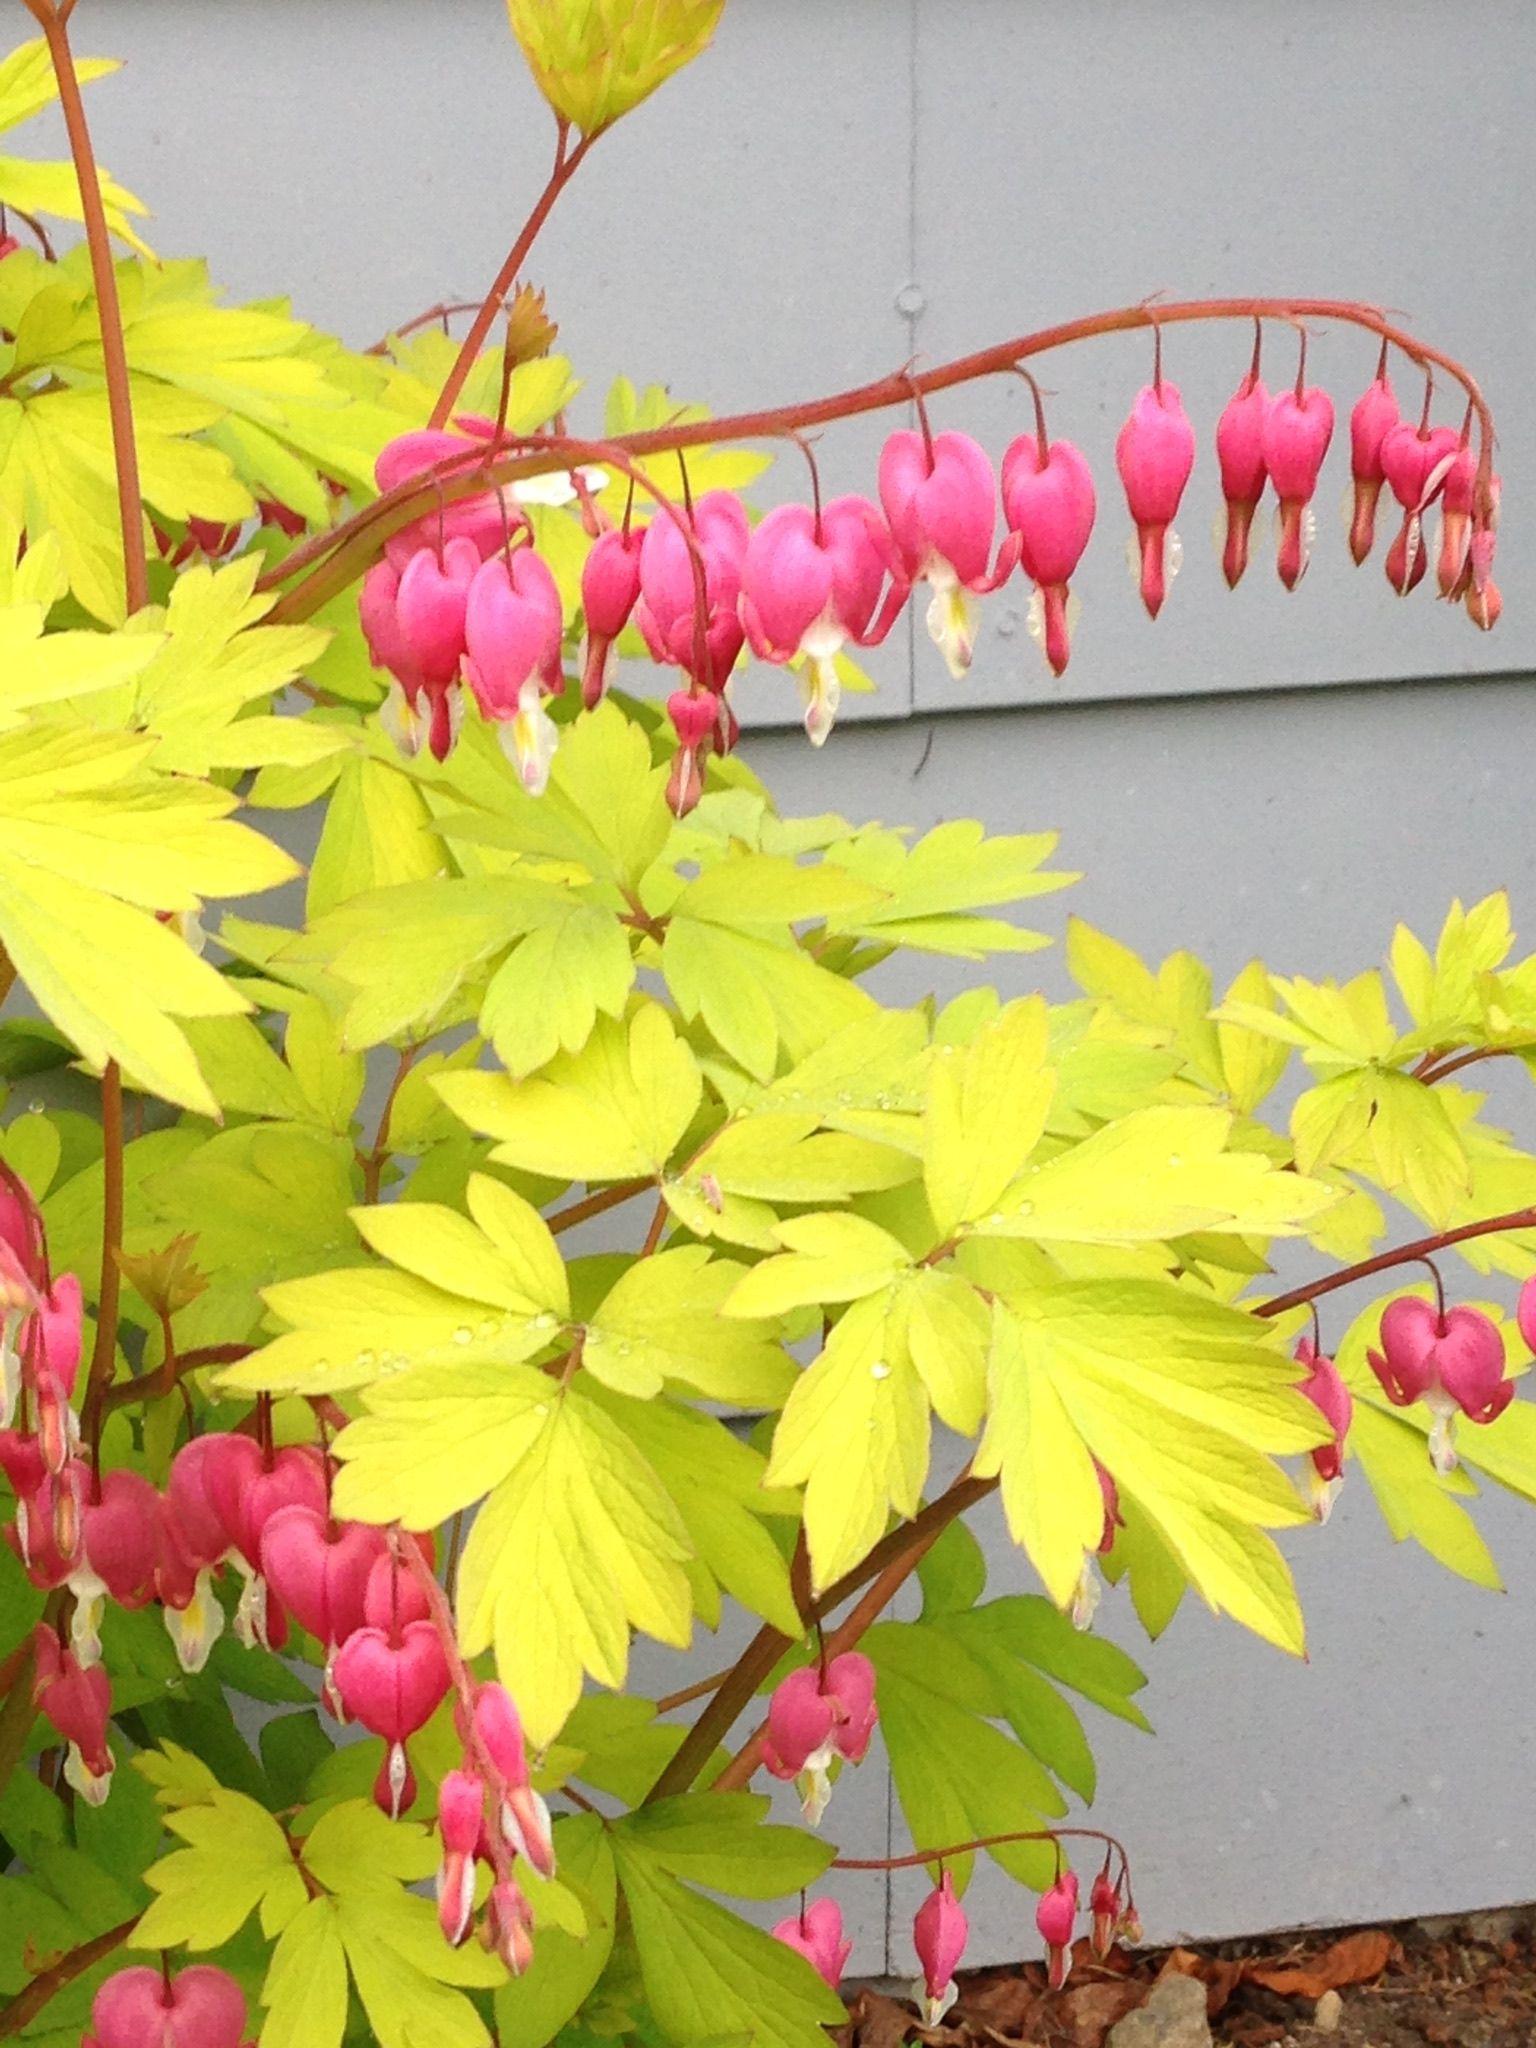 Yellow Leaf Bleeding Heart From My Garden Bleeding Heart Yellow Leaves Flowers